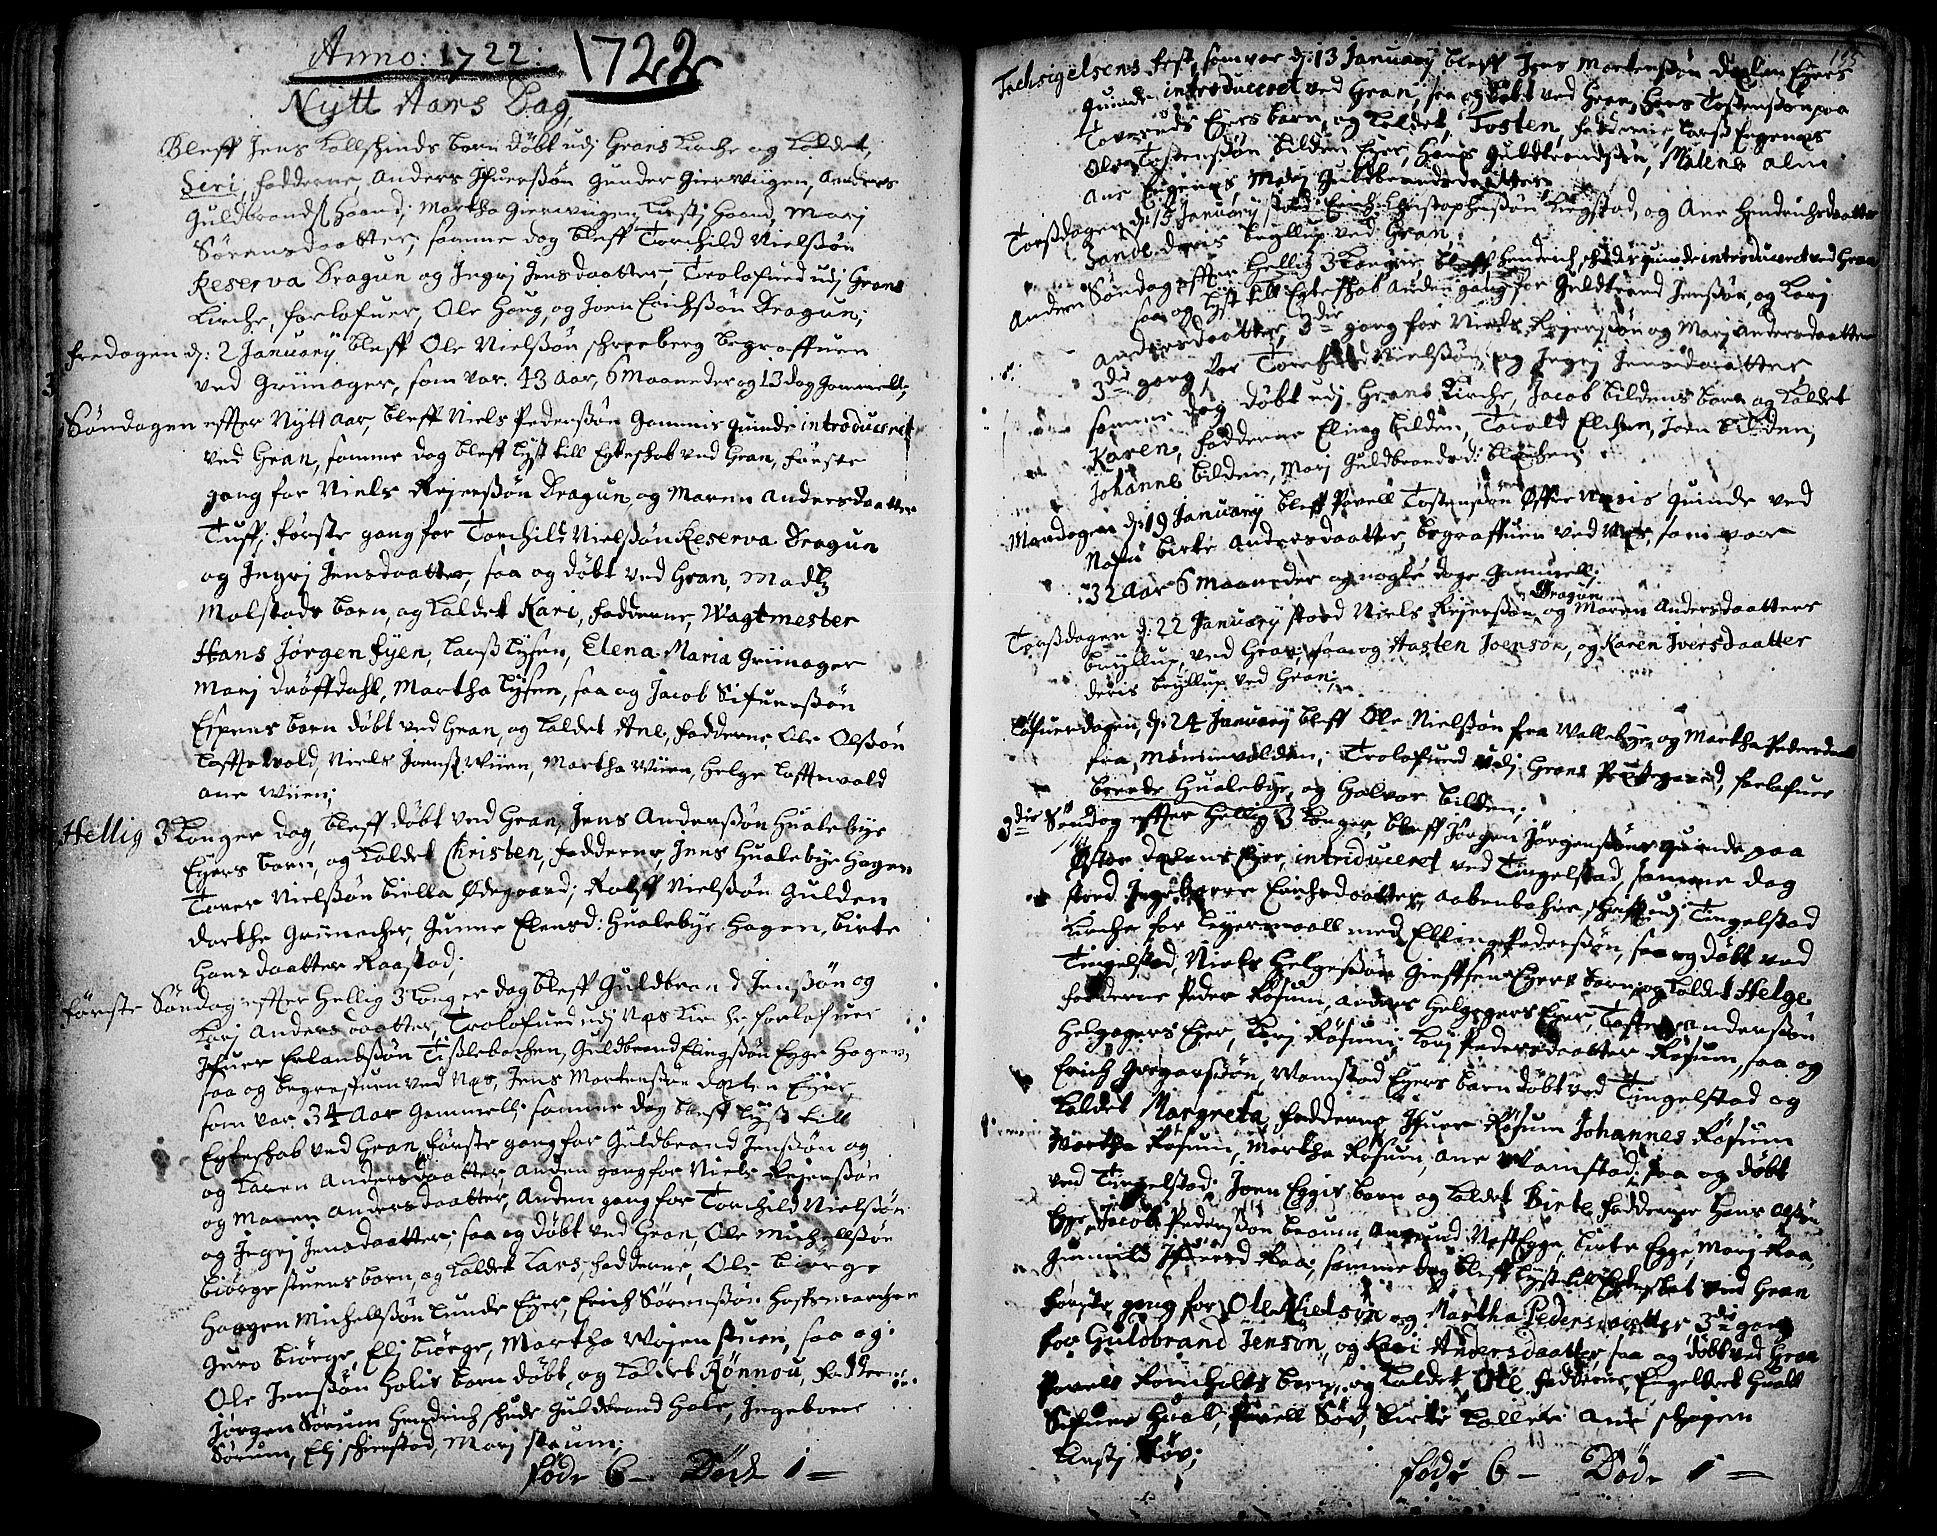 SAH, Gran prestekontor, Ministerialbok nr. 1, 1707-1731, s. 135